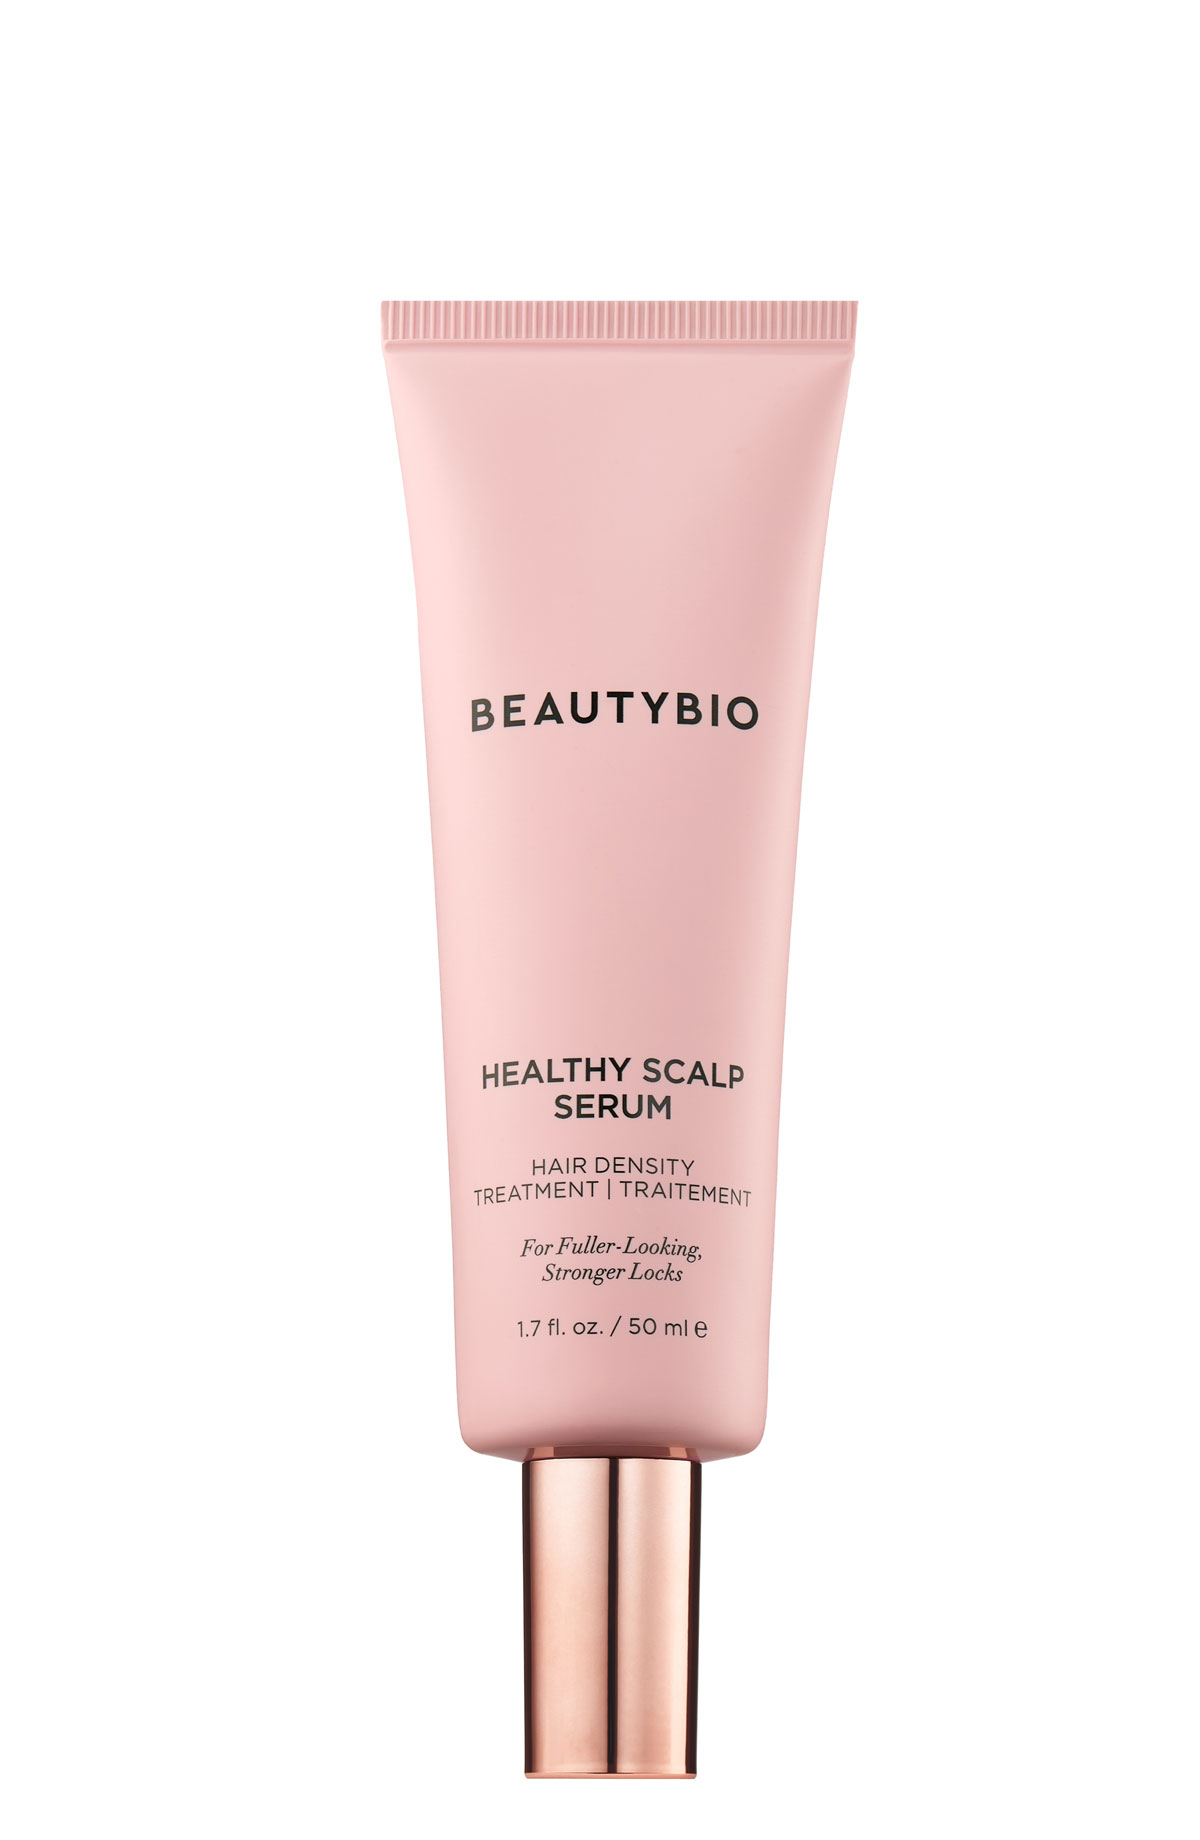 1.7 oz. Healthy Scalp Serum Hair Density Treatment